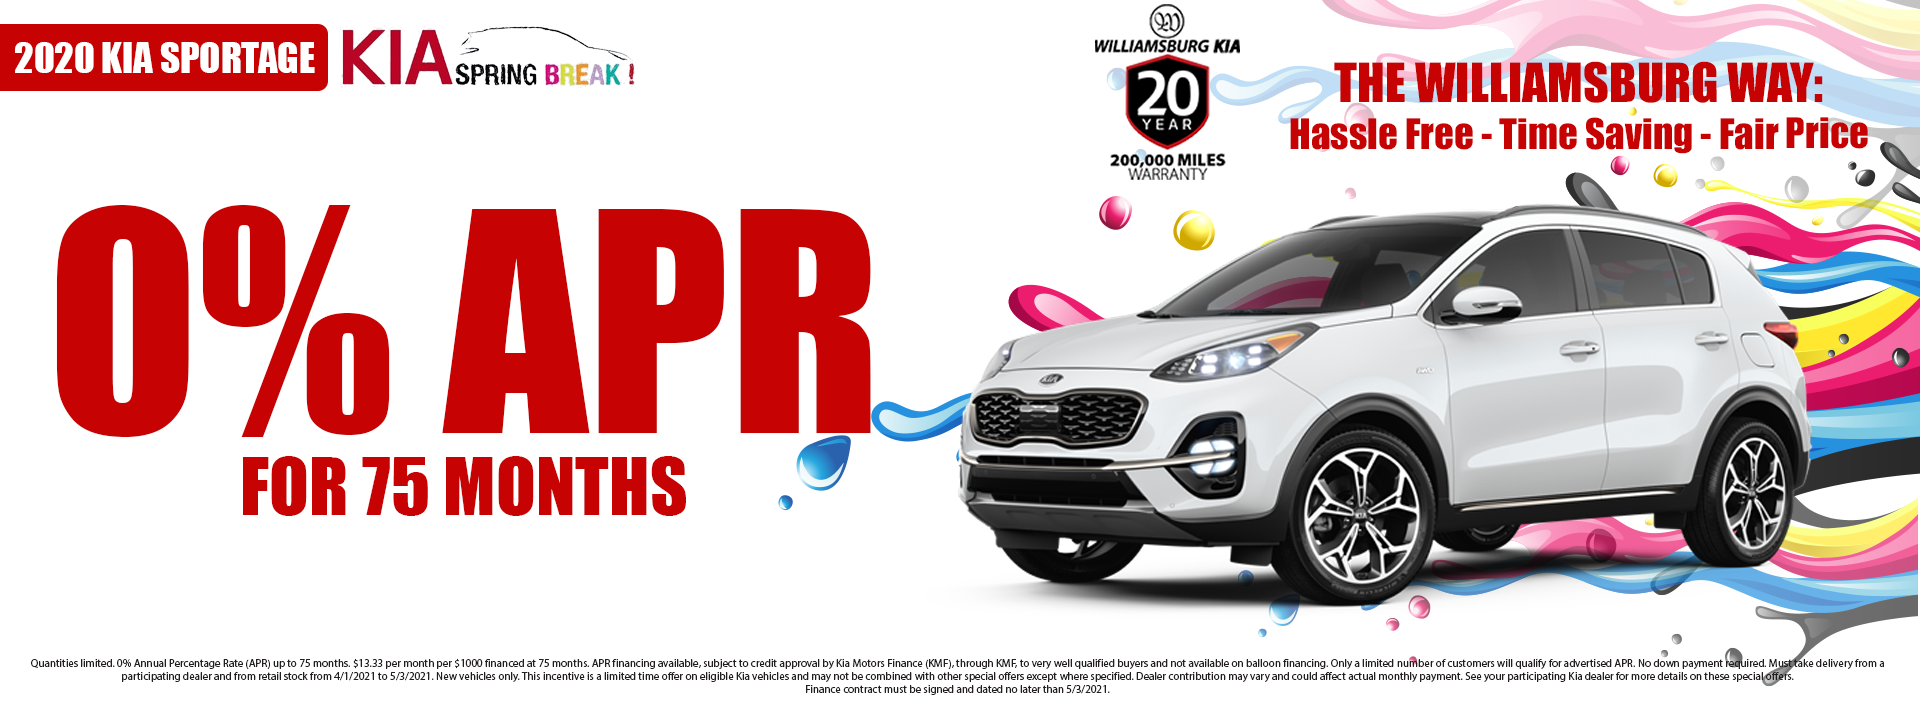 2020 Kia Sportage 0% APR for 75 Months